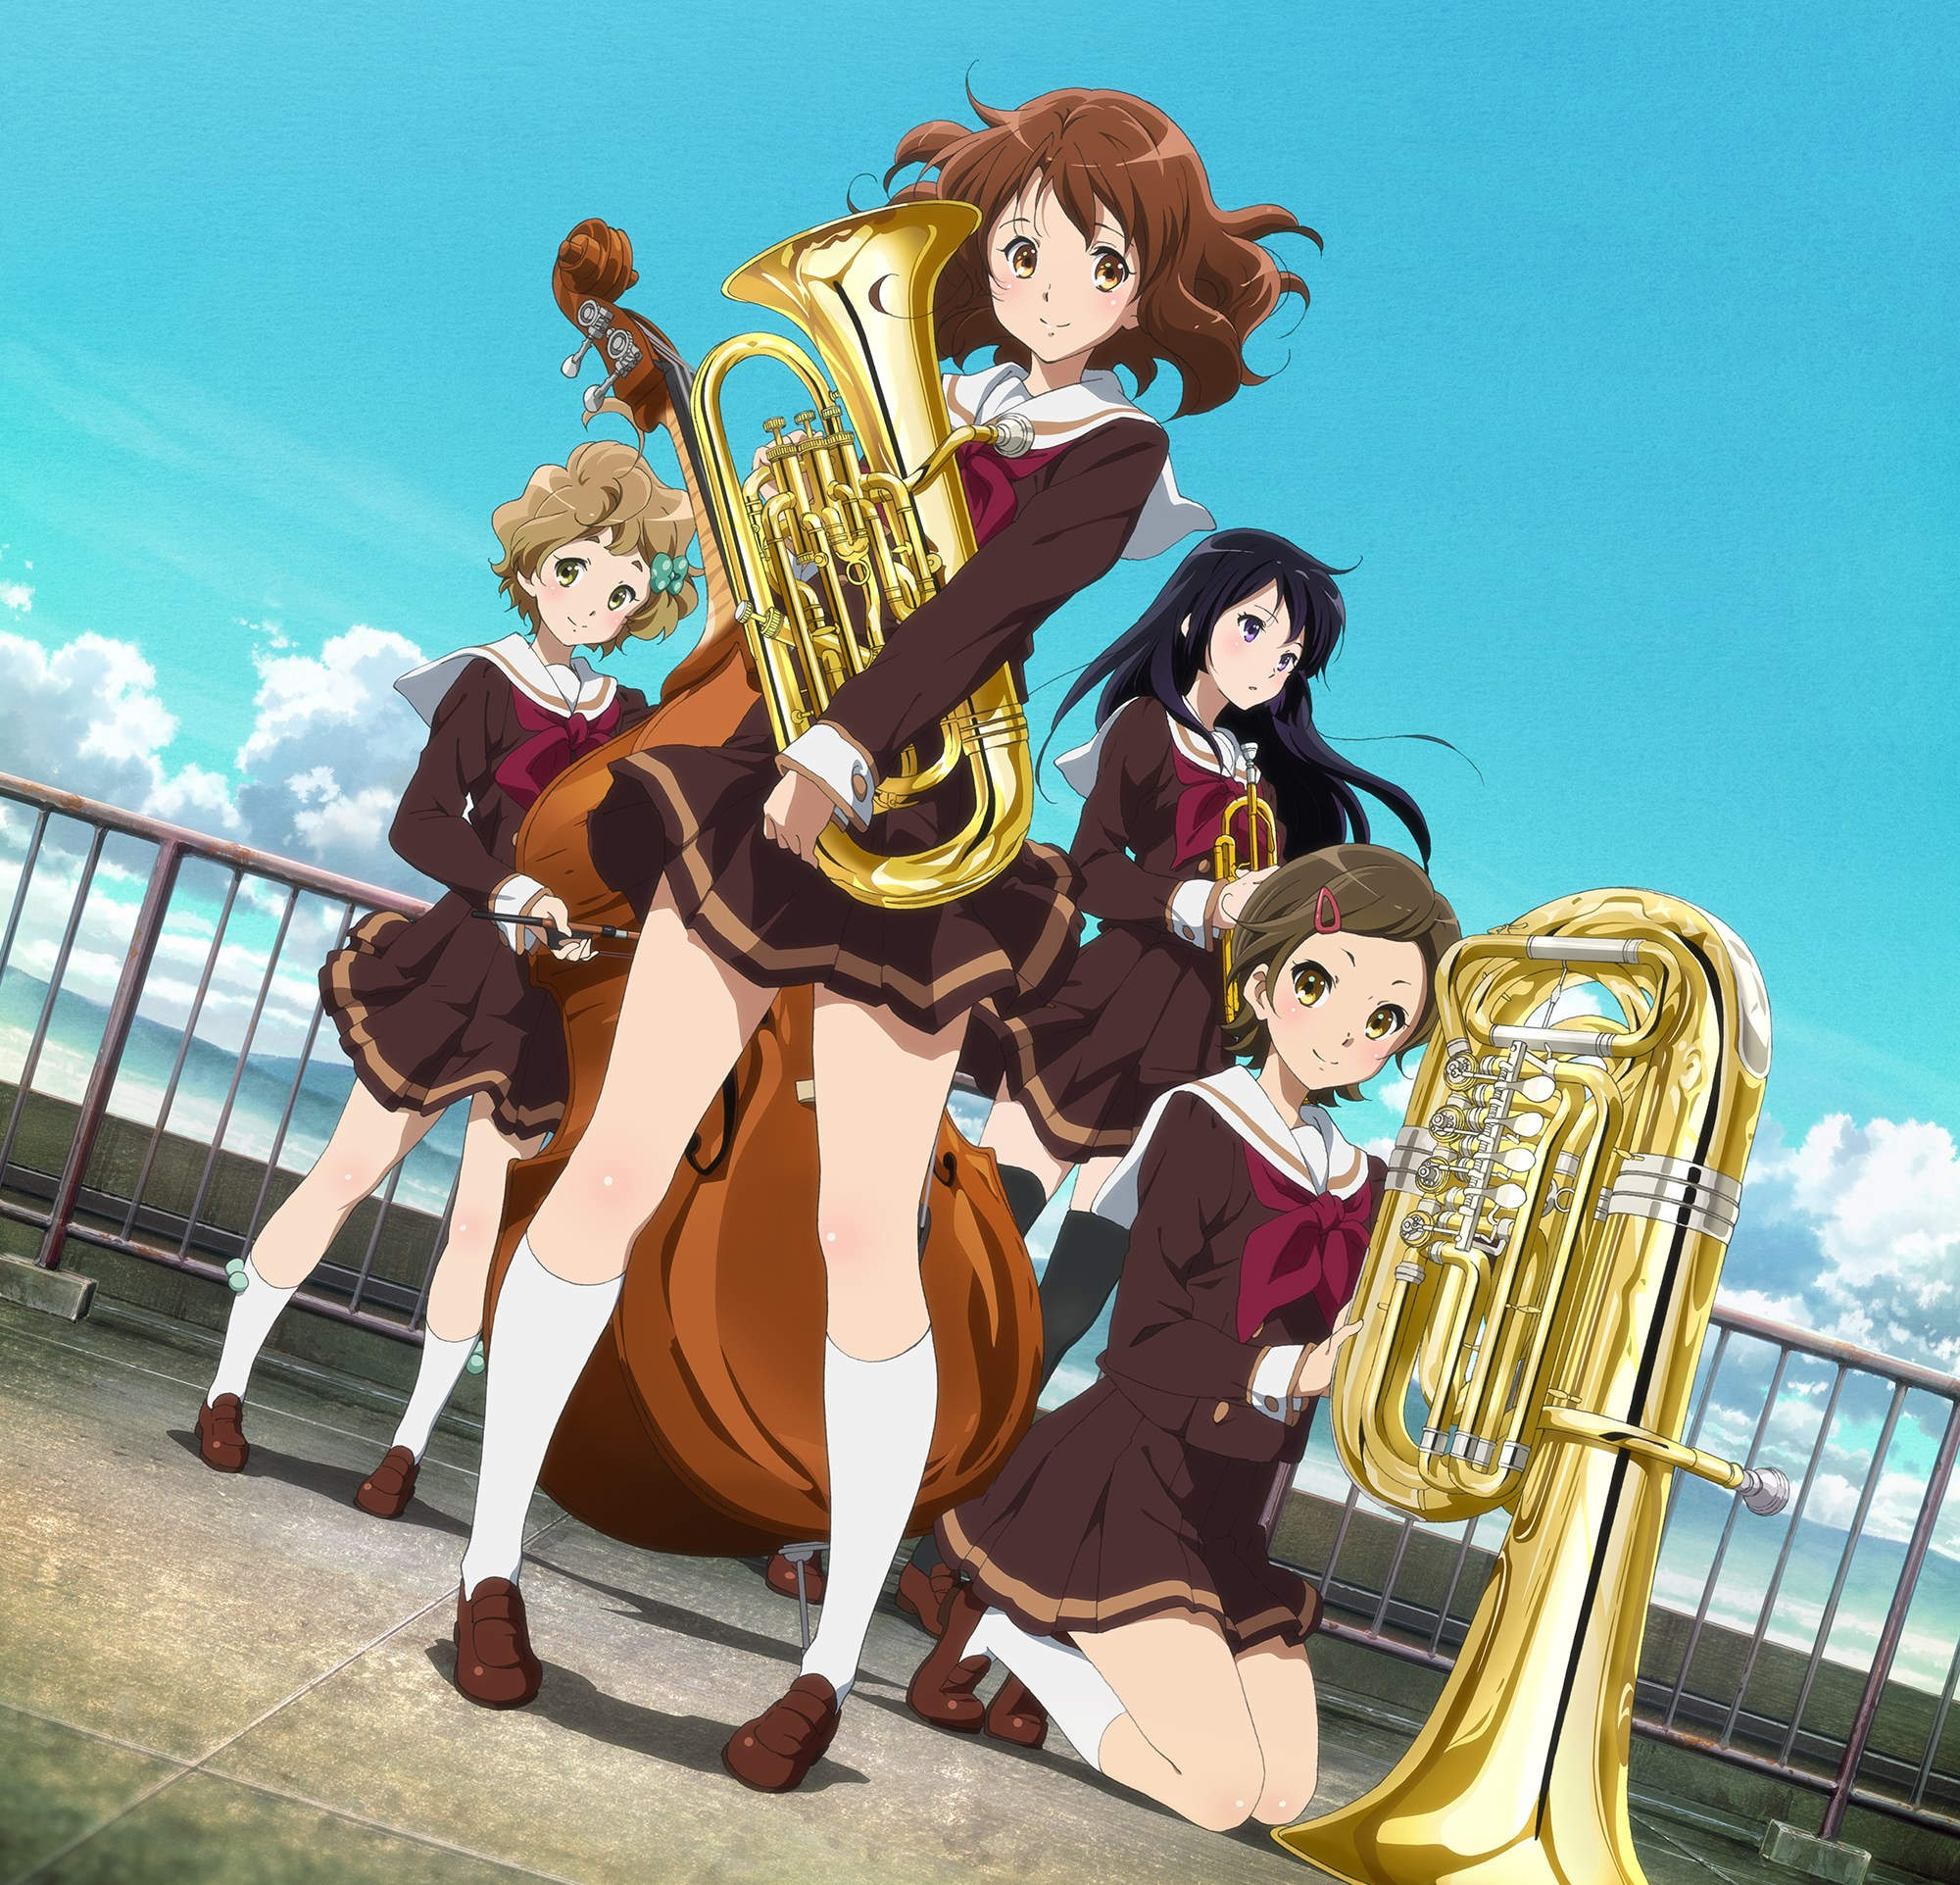 New Visual Revealed for Kyoto Animation's Sound! Euphonium Anime haruhichan.com Hibike! Euphonium anime visual